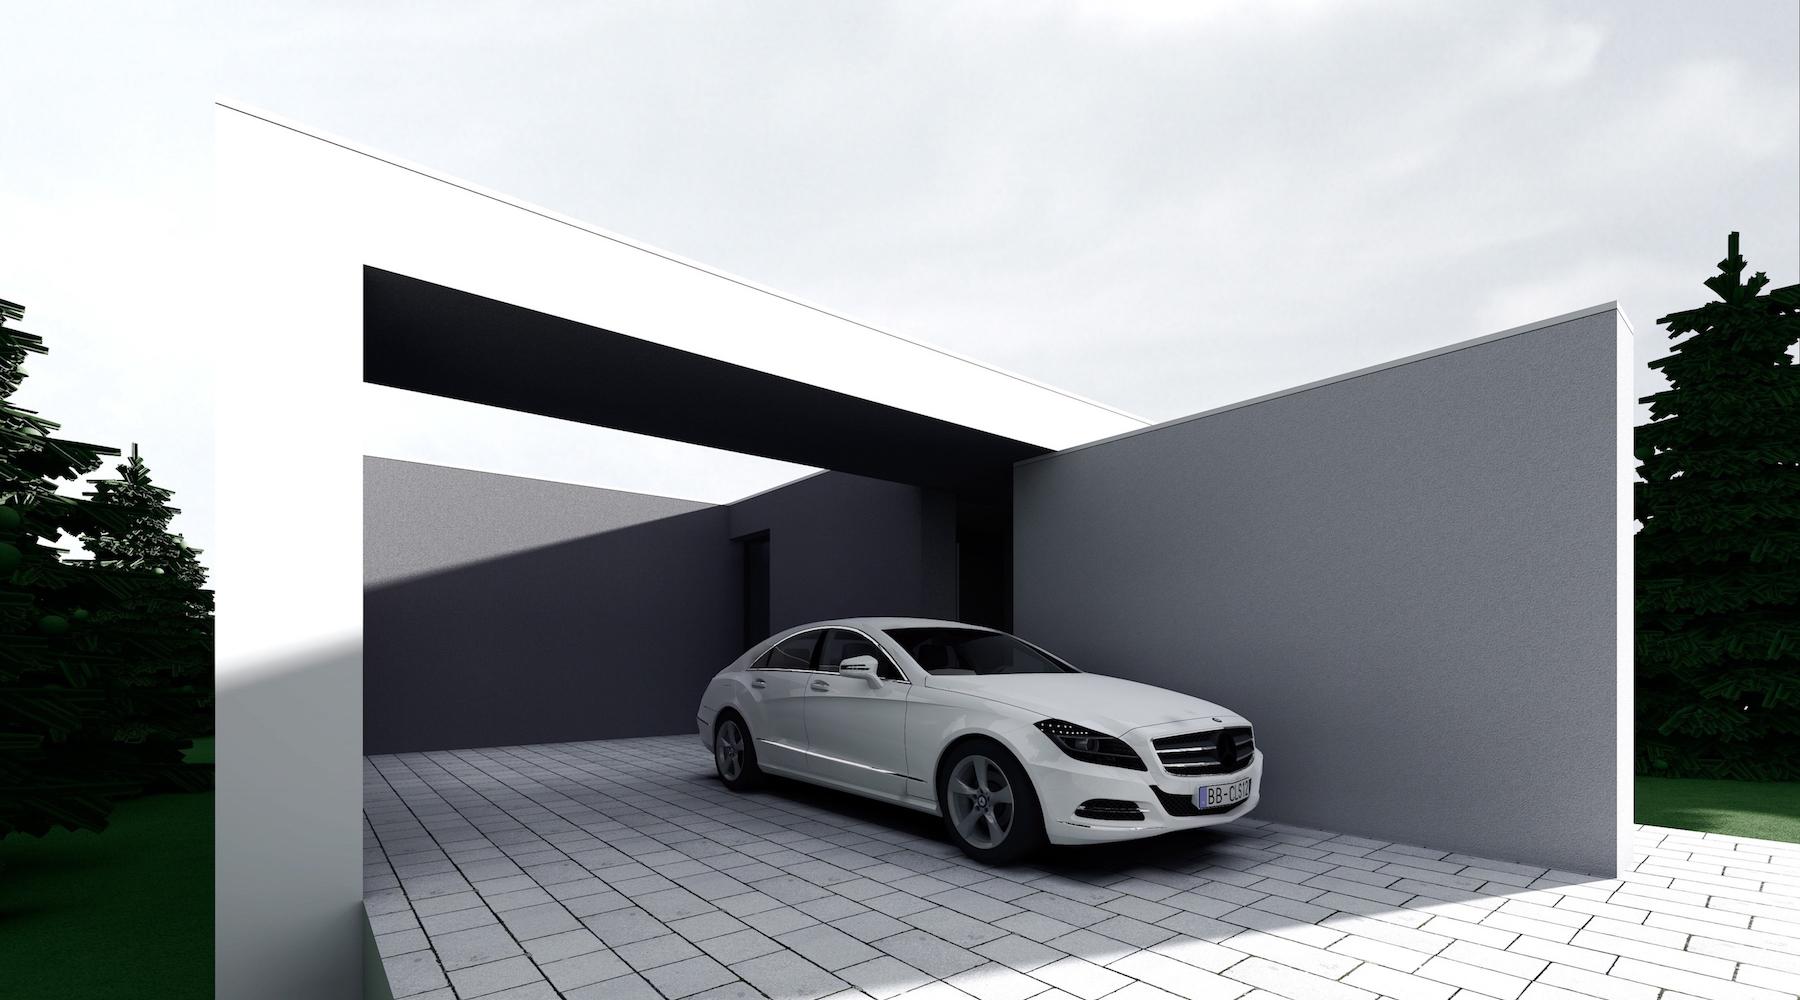 architekt_lodz_pv_house_inuti_04